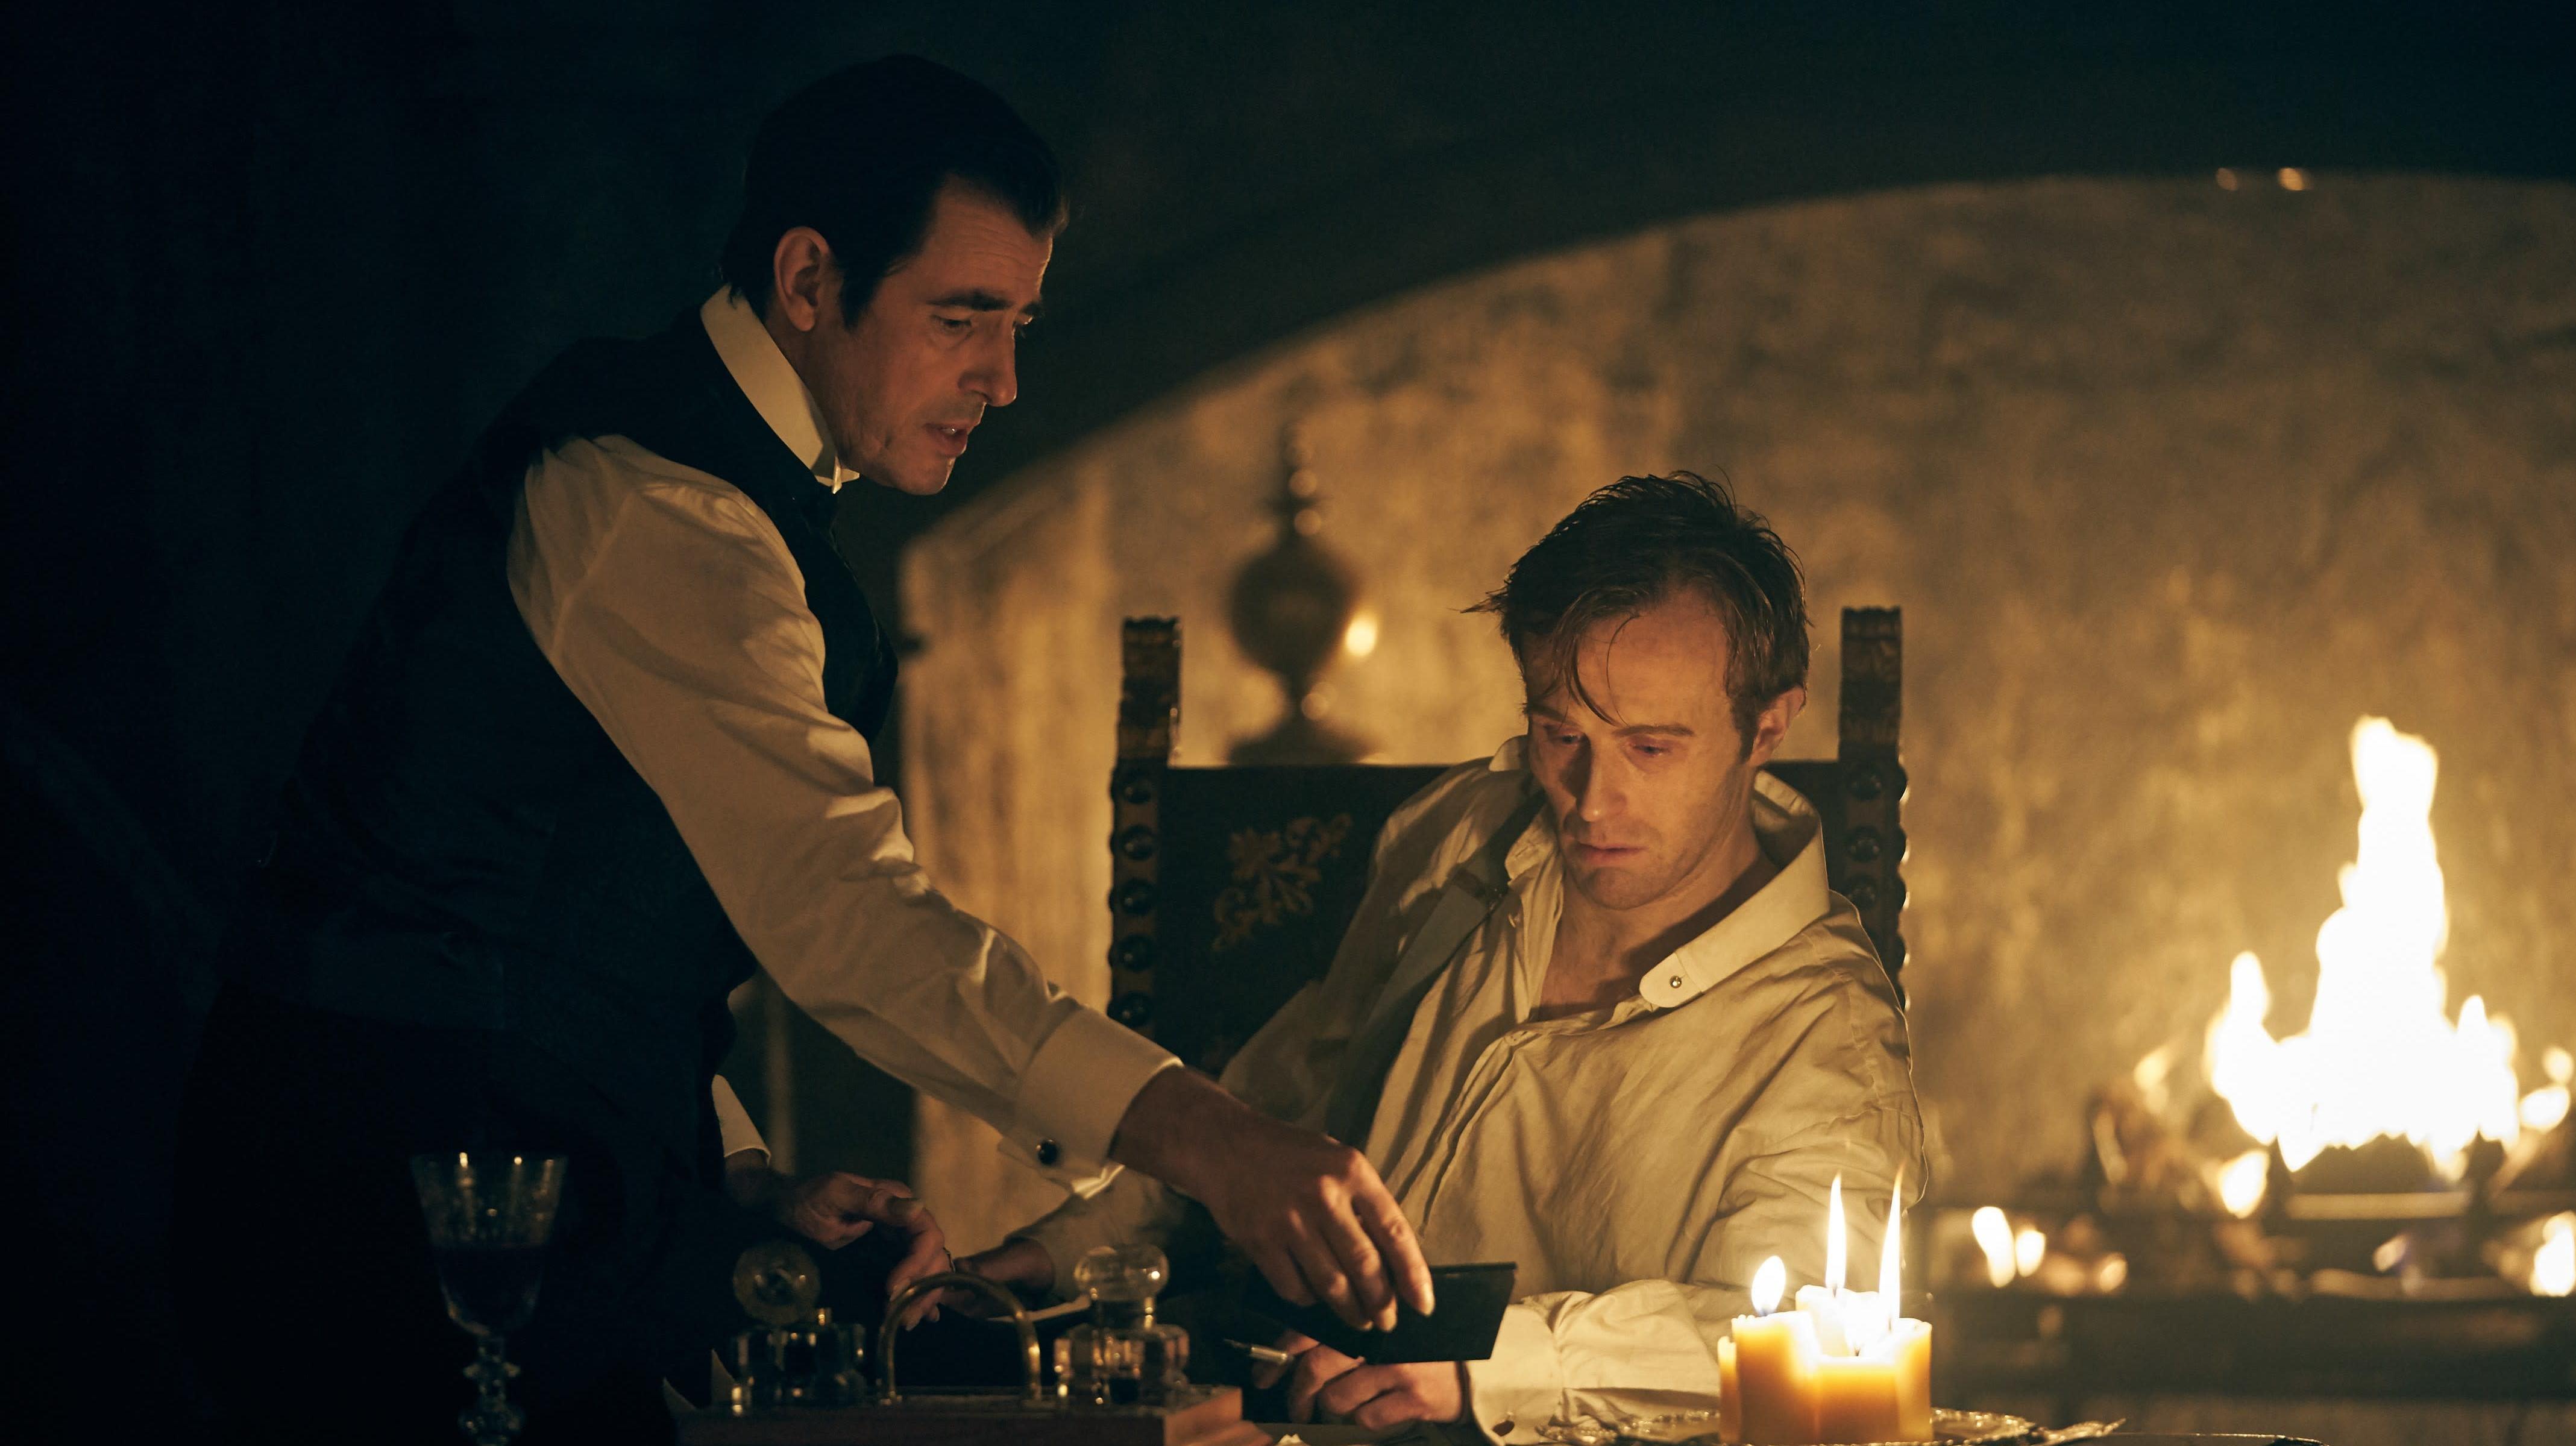 Steven Moffat's Dracula Trailer Teases A 'Bi-Homicidal' Villain